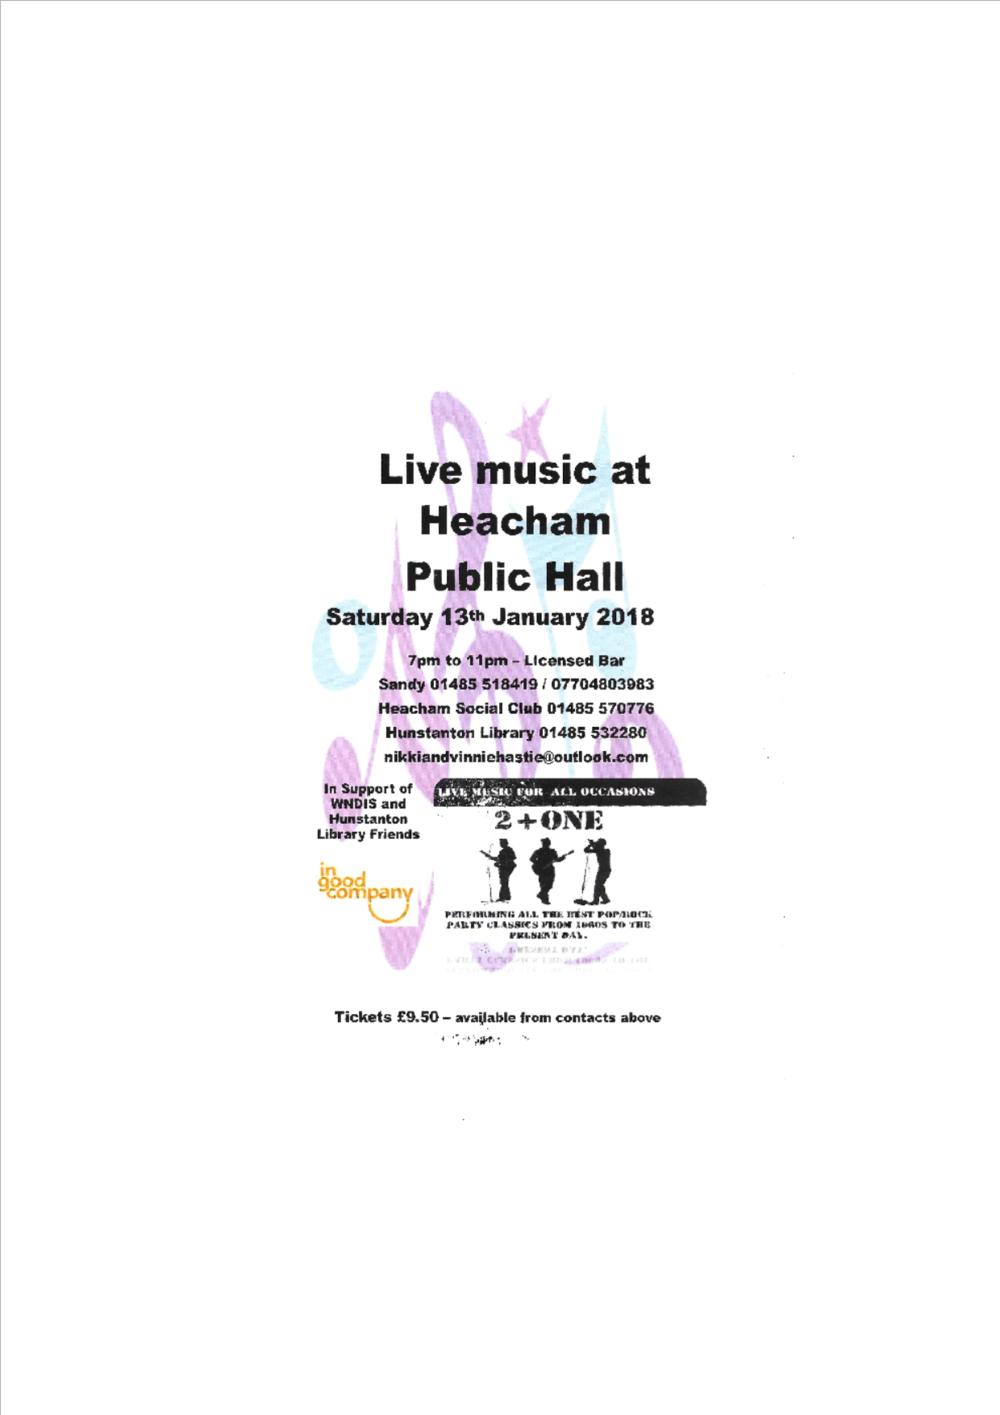 heacham2.png